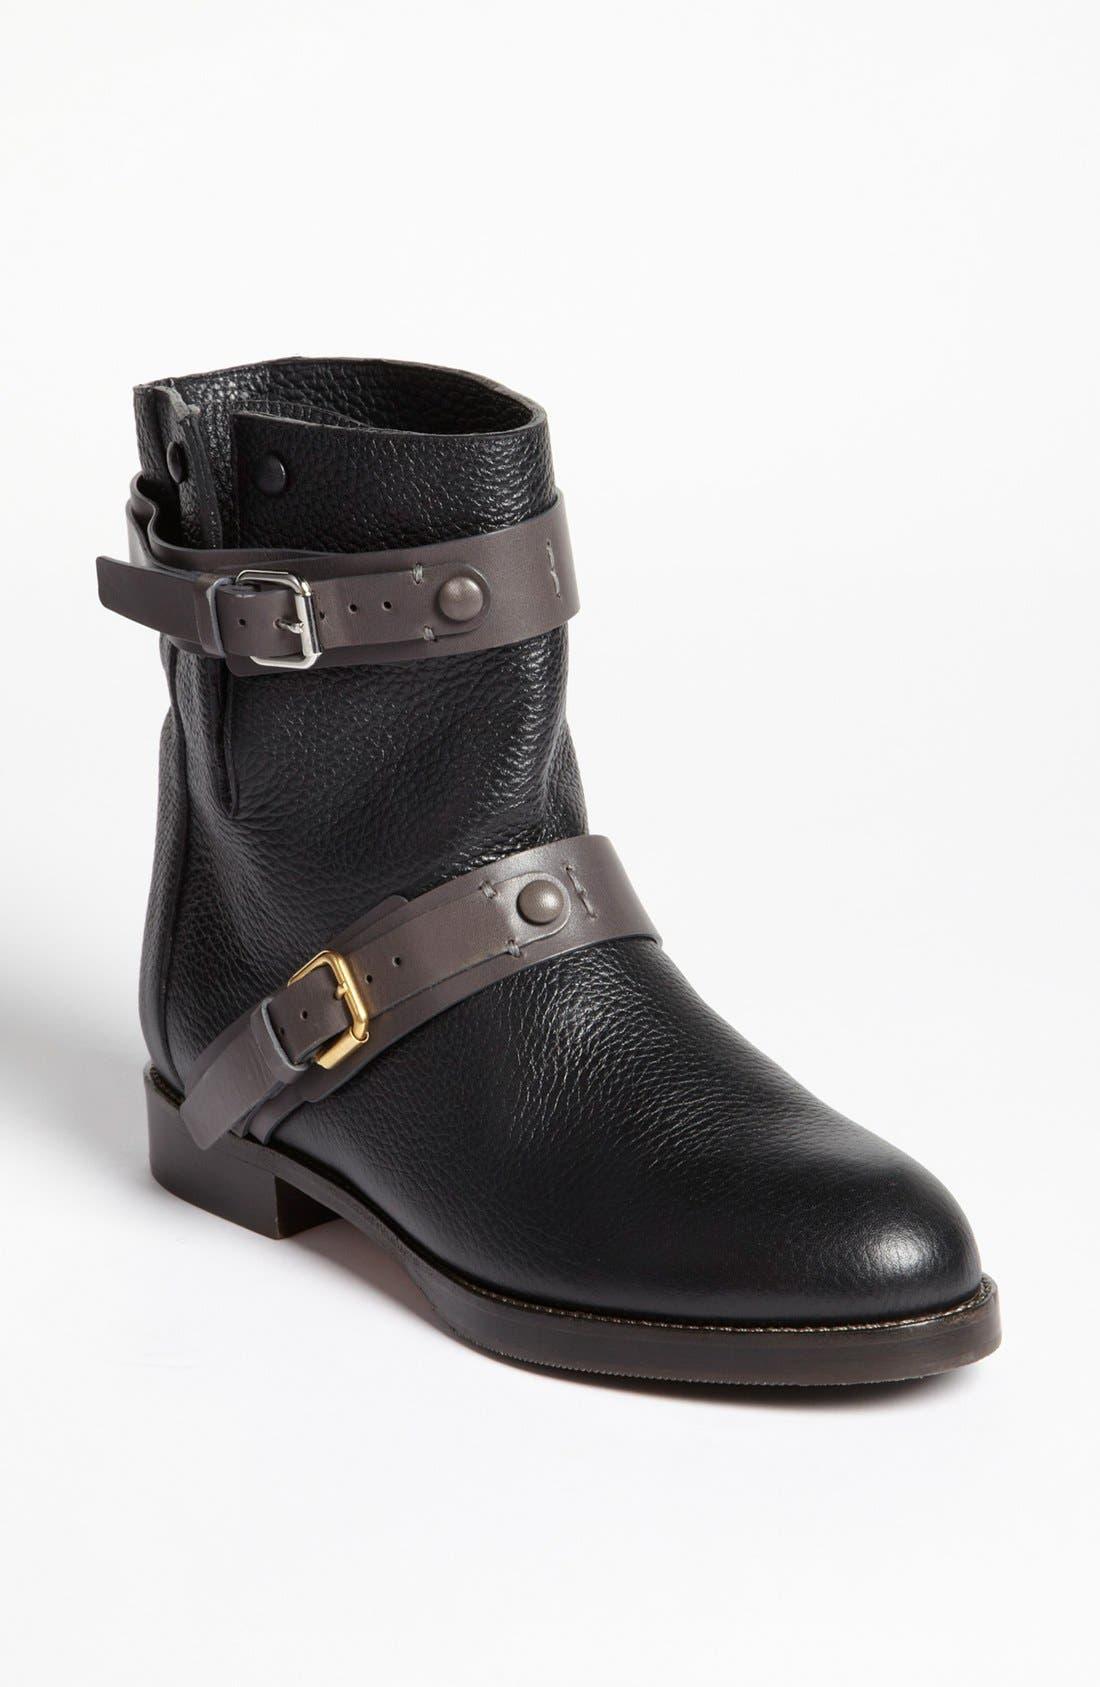 Main Image - Chloé 'Brune' Buckle Boot